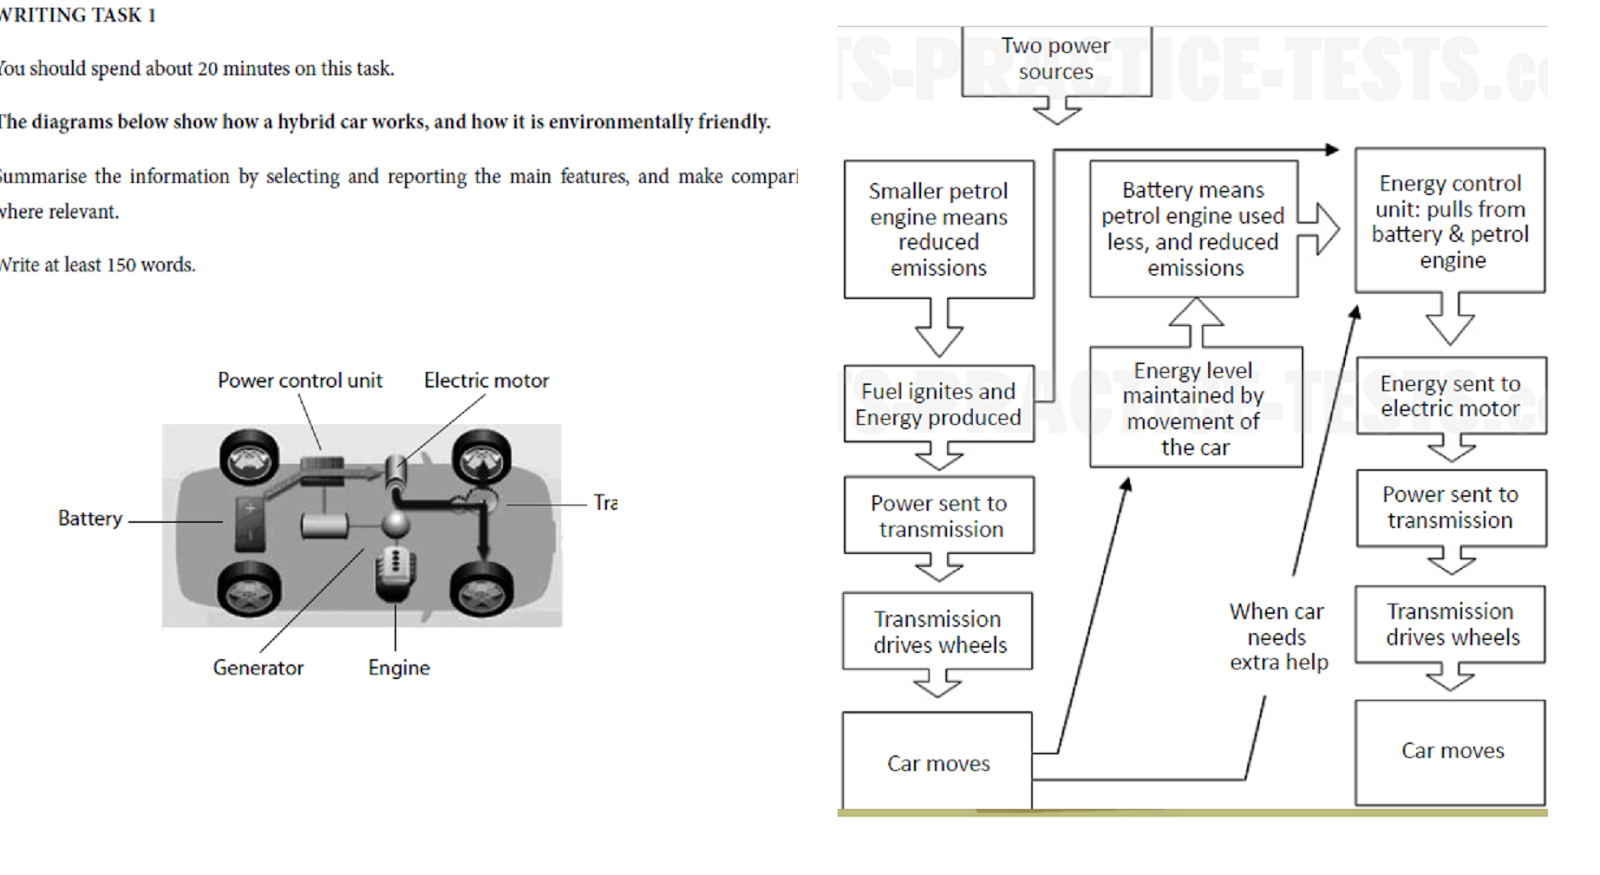 hight resolution of hybrid car flow chart ielts task 1 band 7